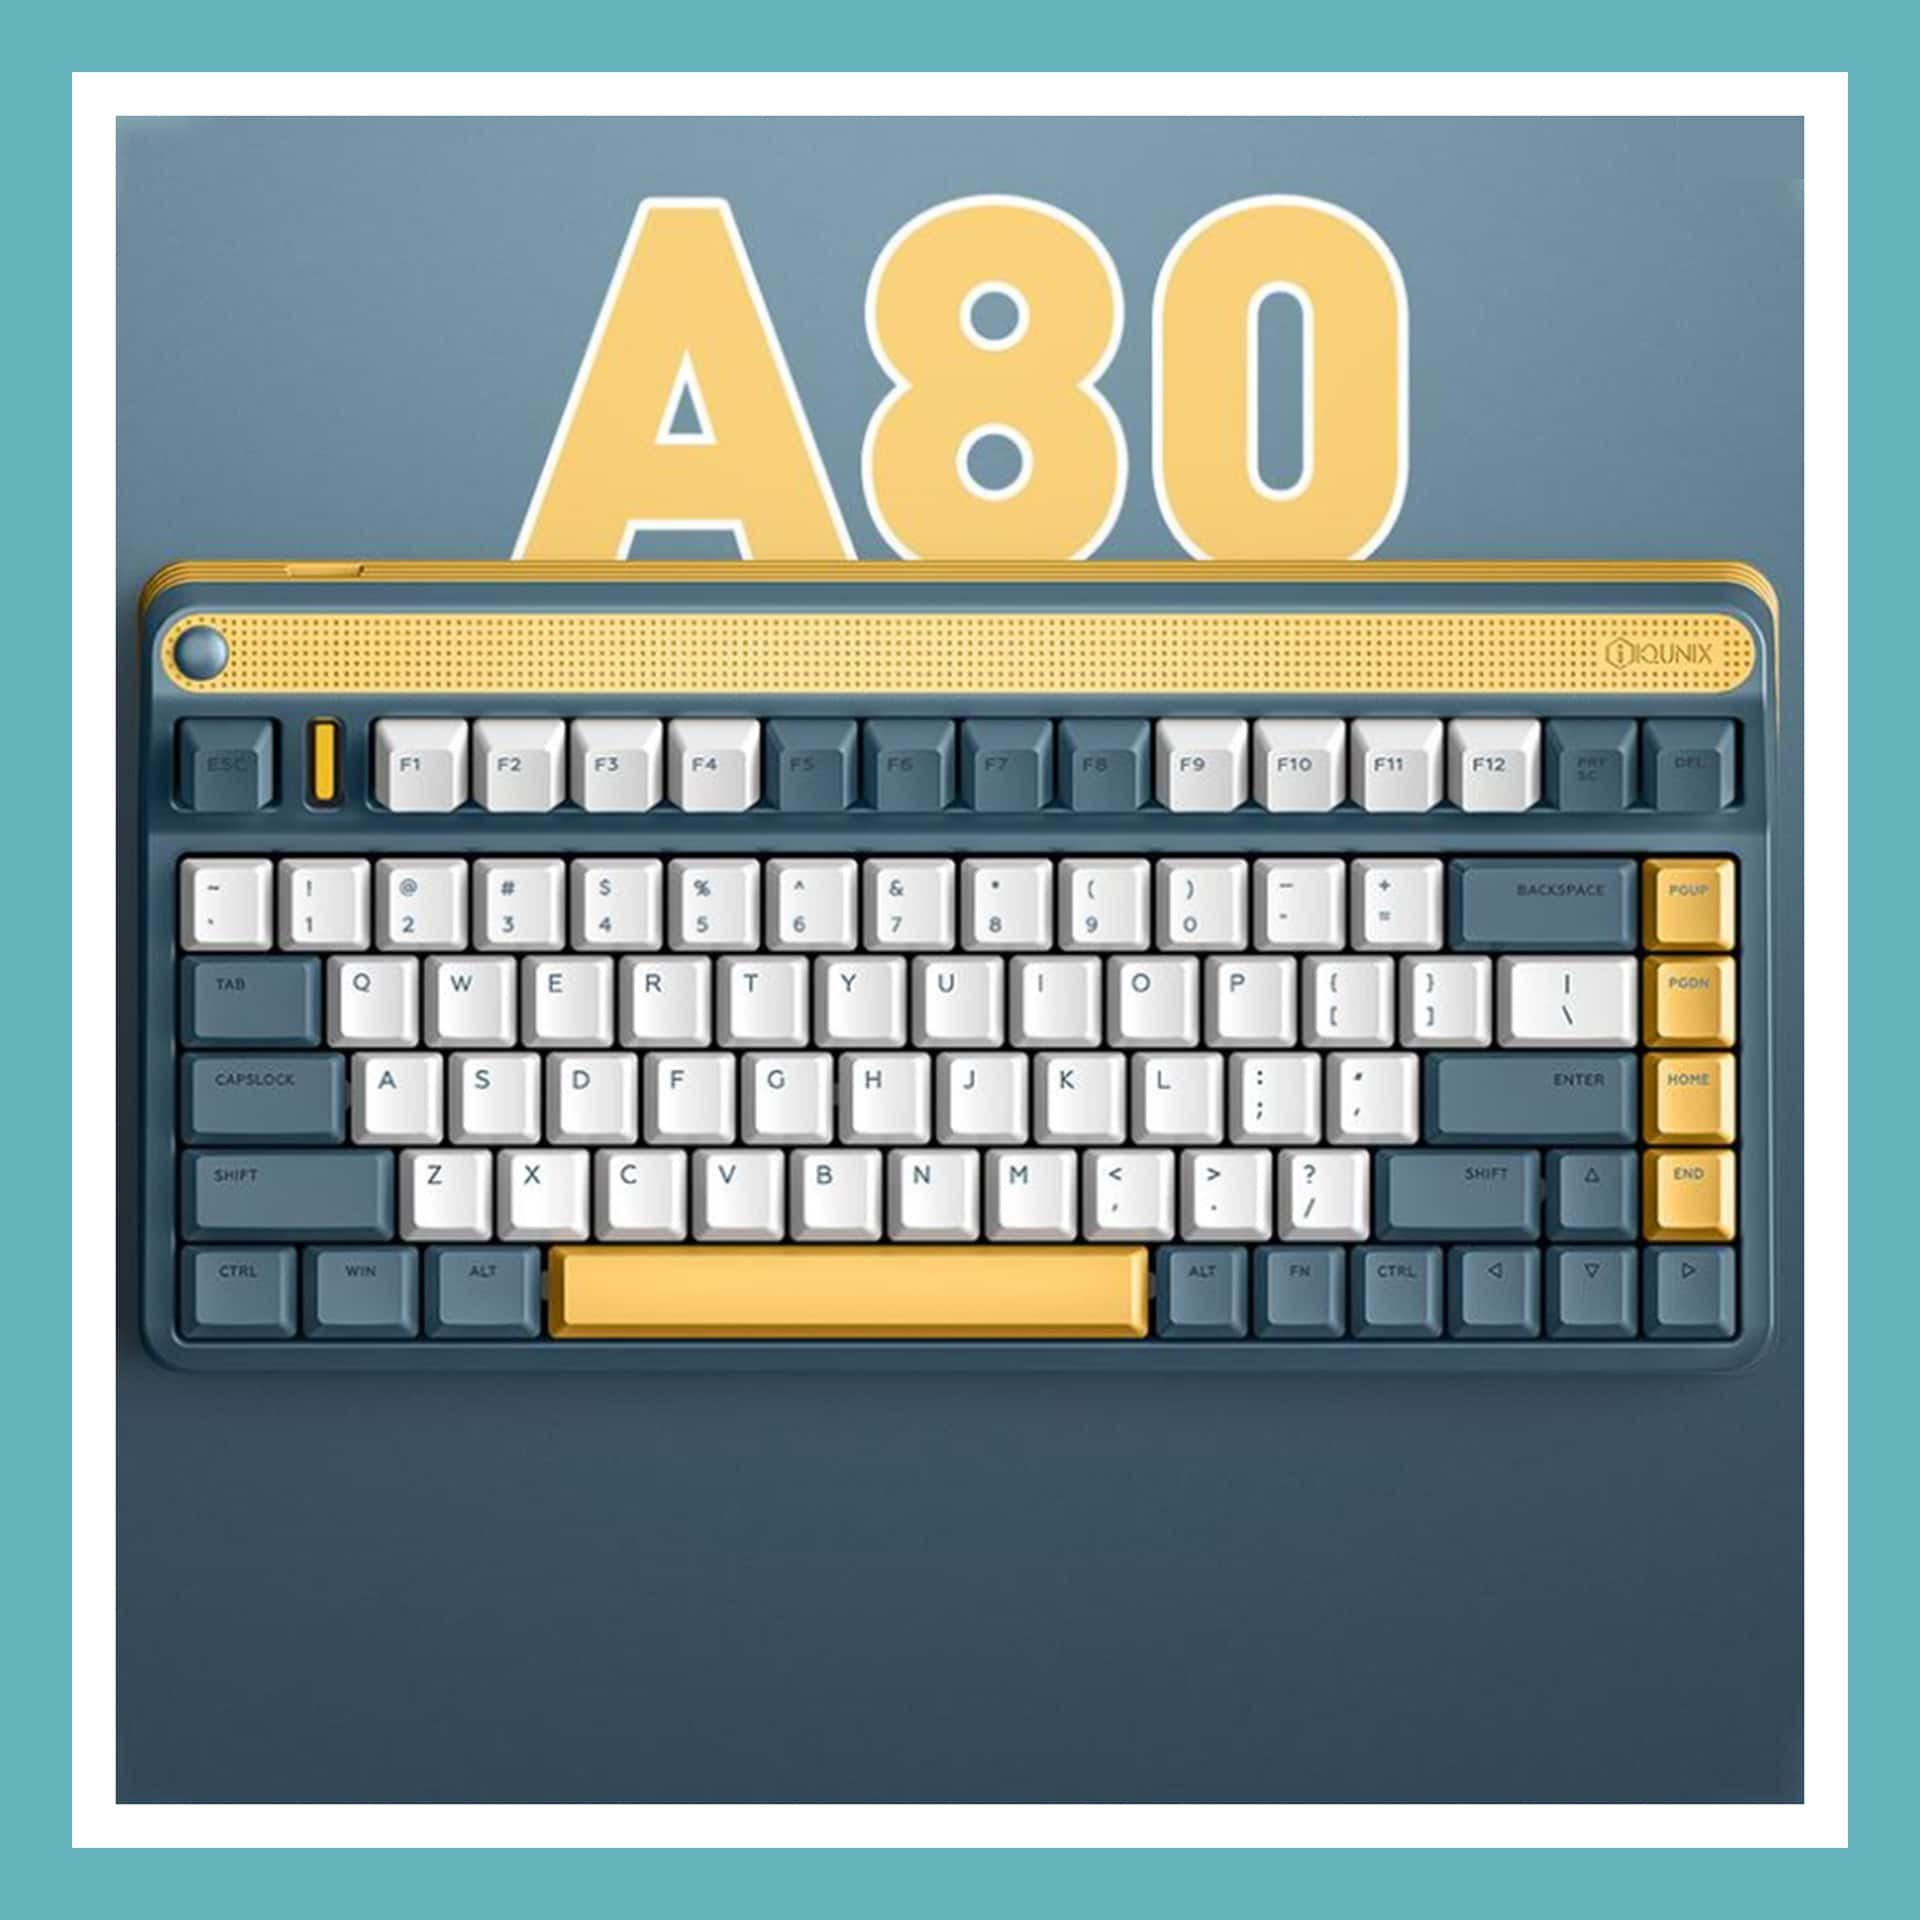 Mechanical Keyboard Trending Product Idea